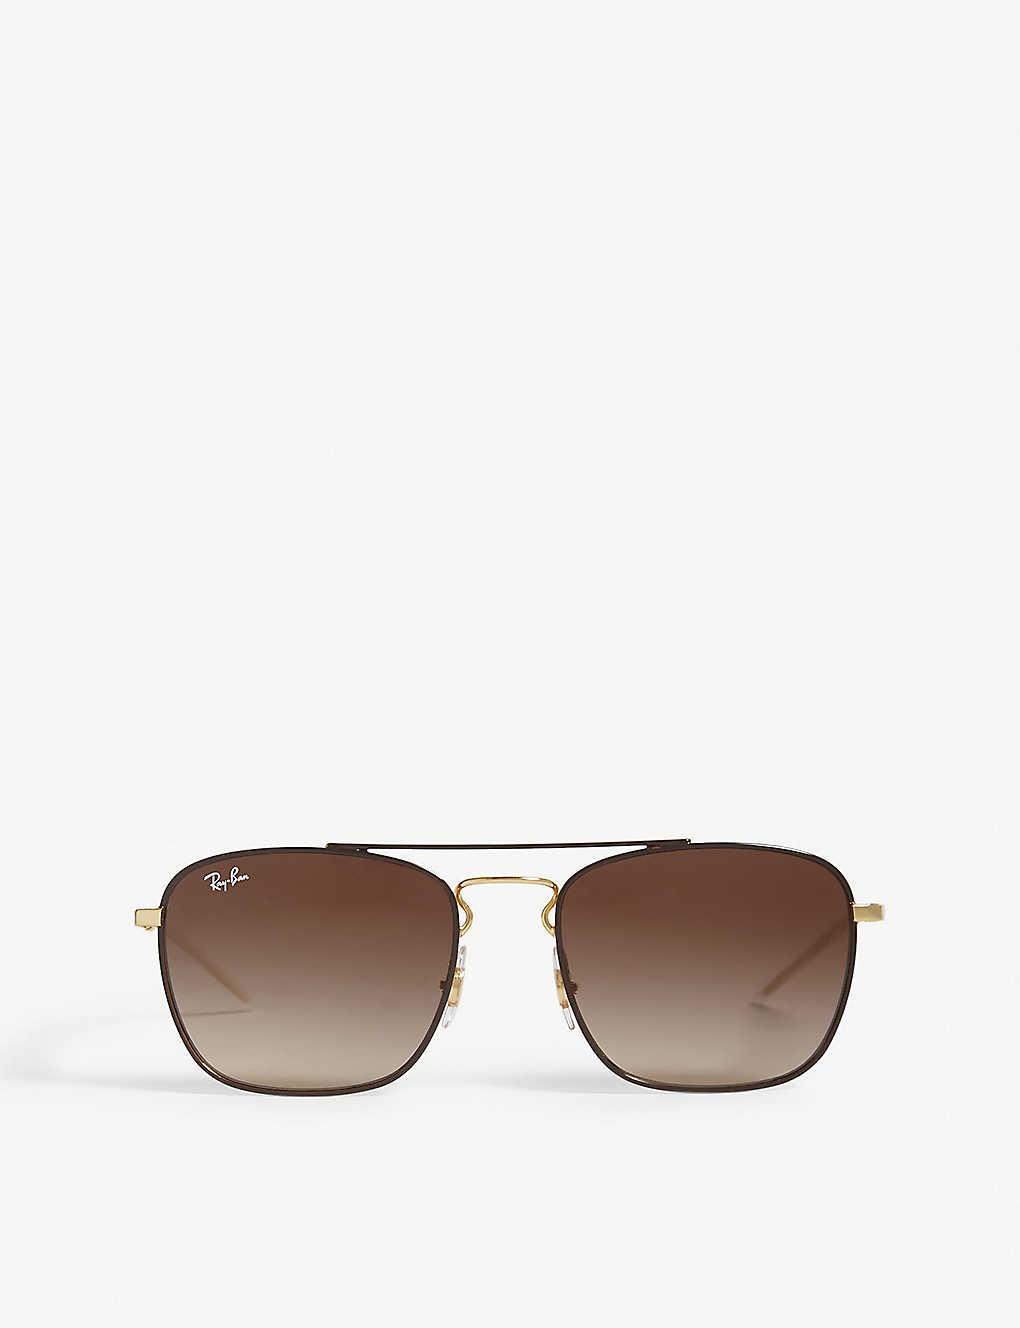 26a0f5dd786e8 Rb3588 square-frame sunglasses - Brown ...